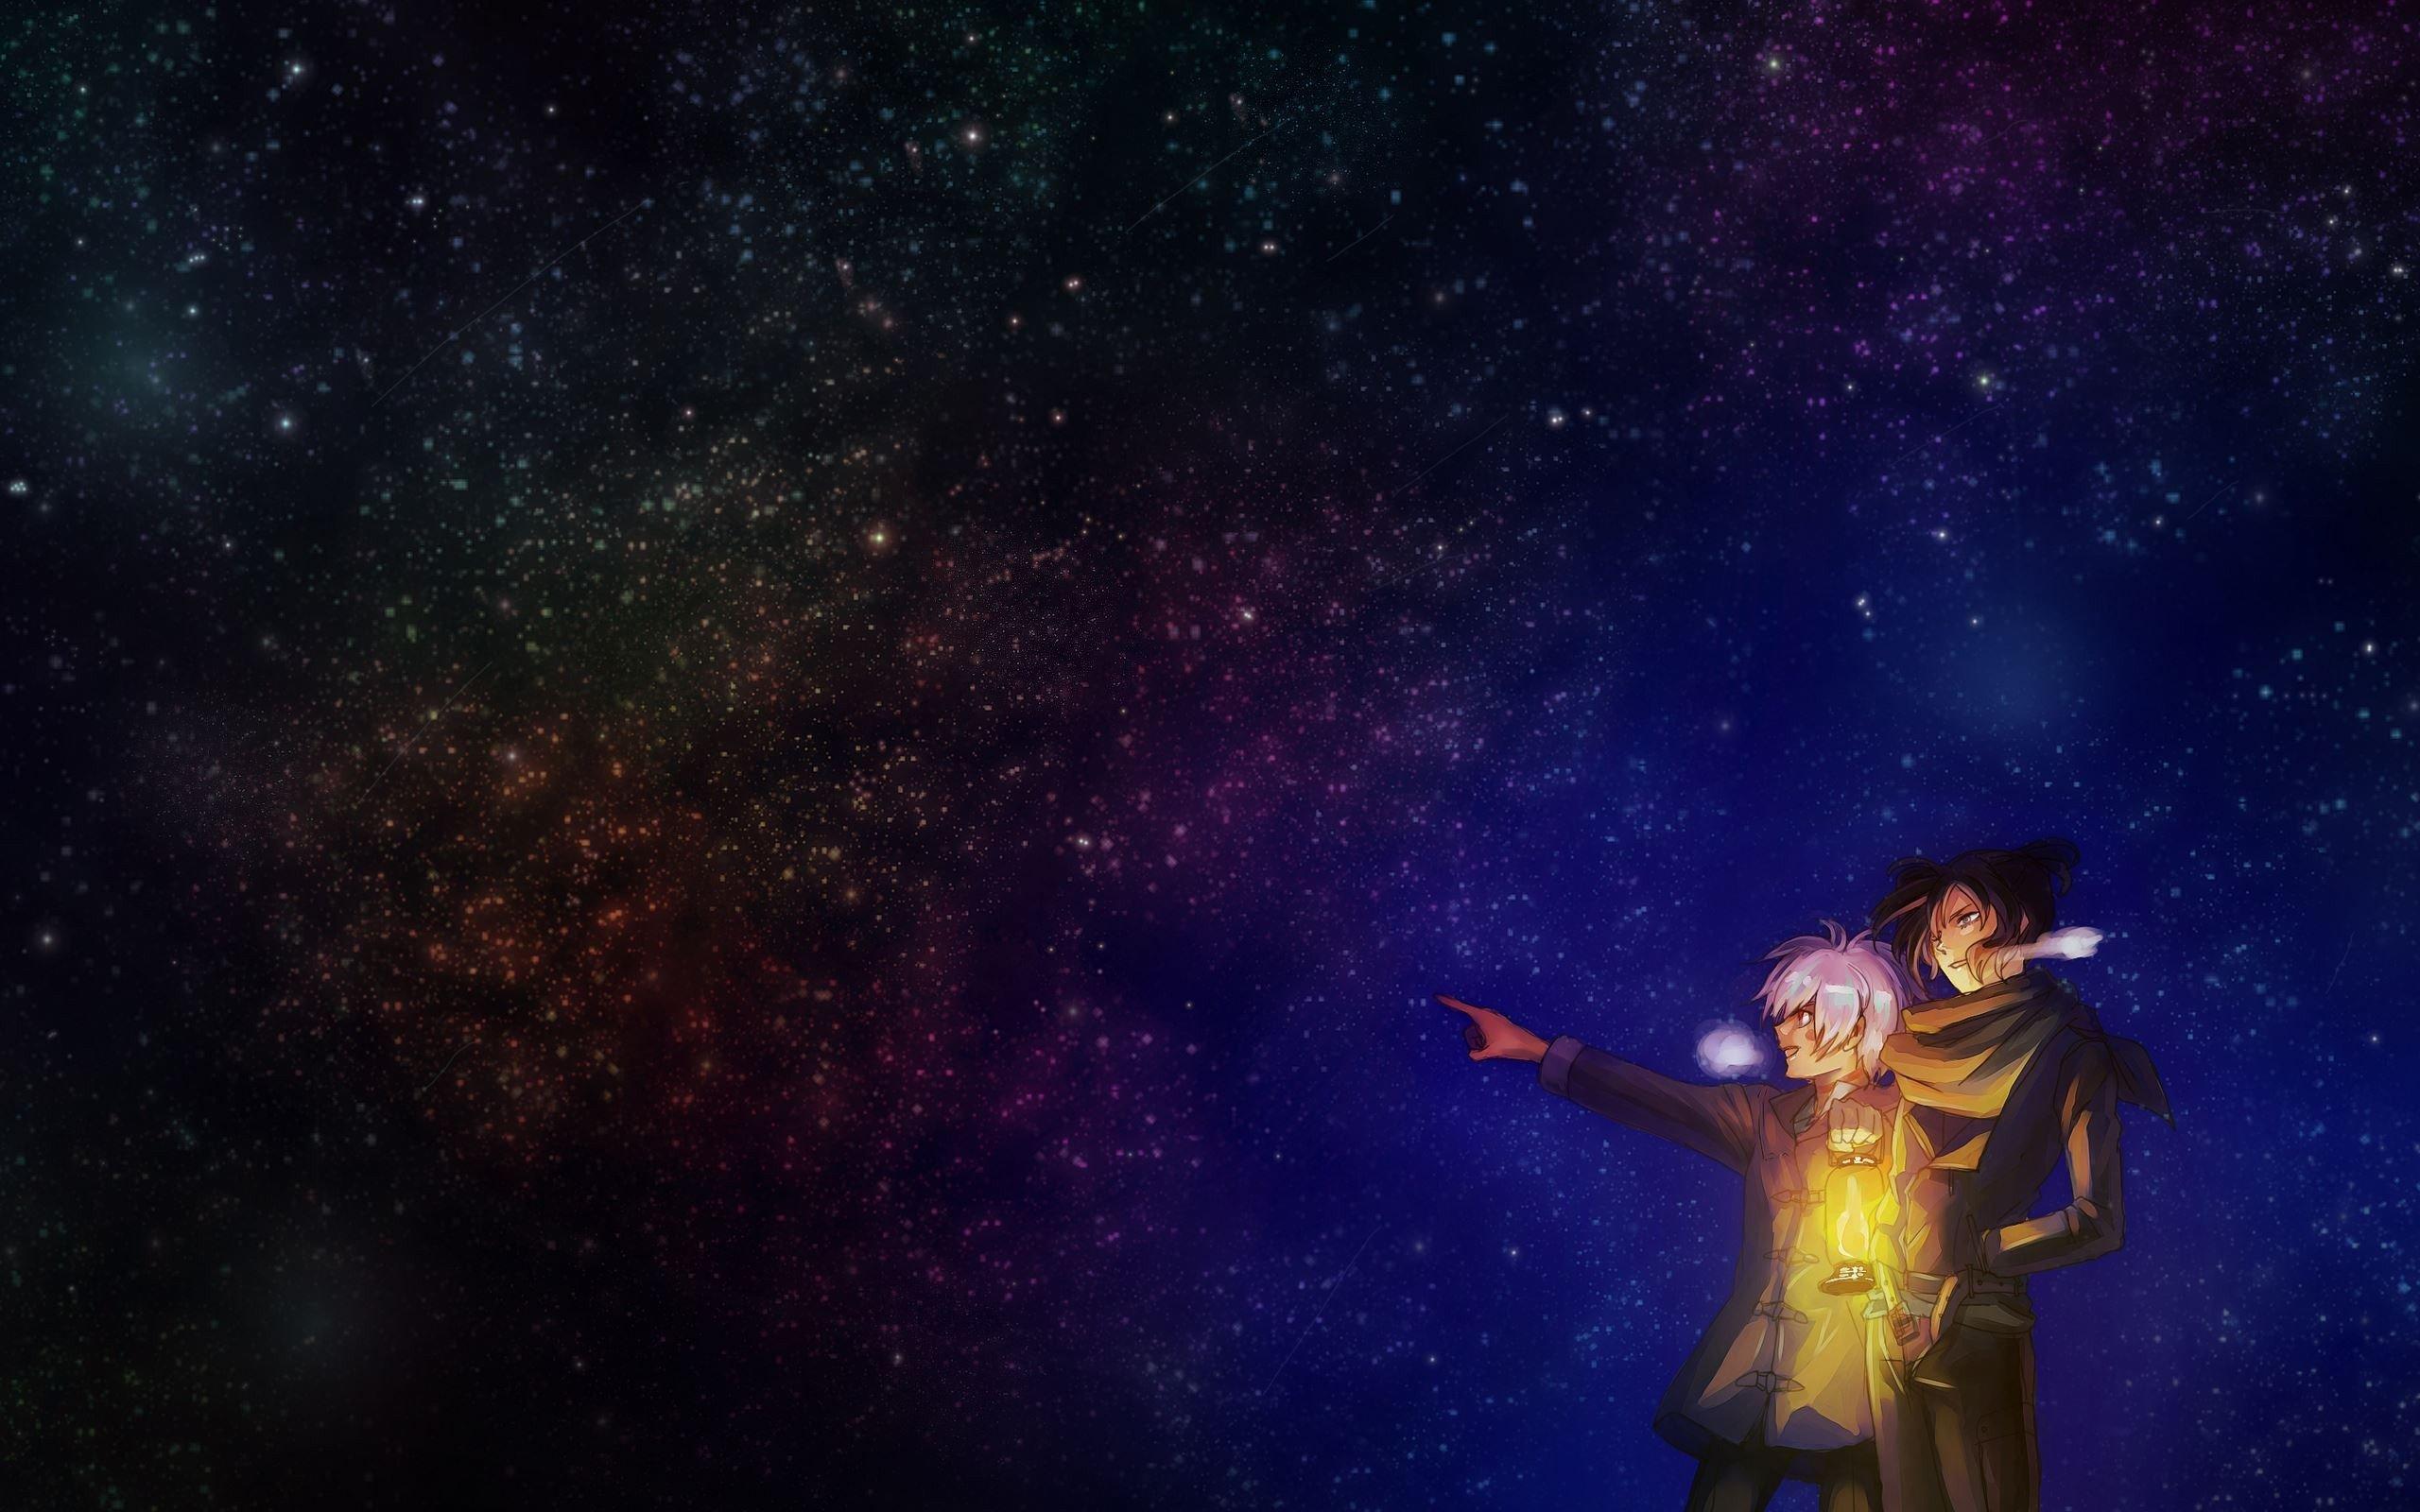 Night Stars Lantern Anime Sky Wallpaper 2560x1600 726634 Wallpaperup